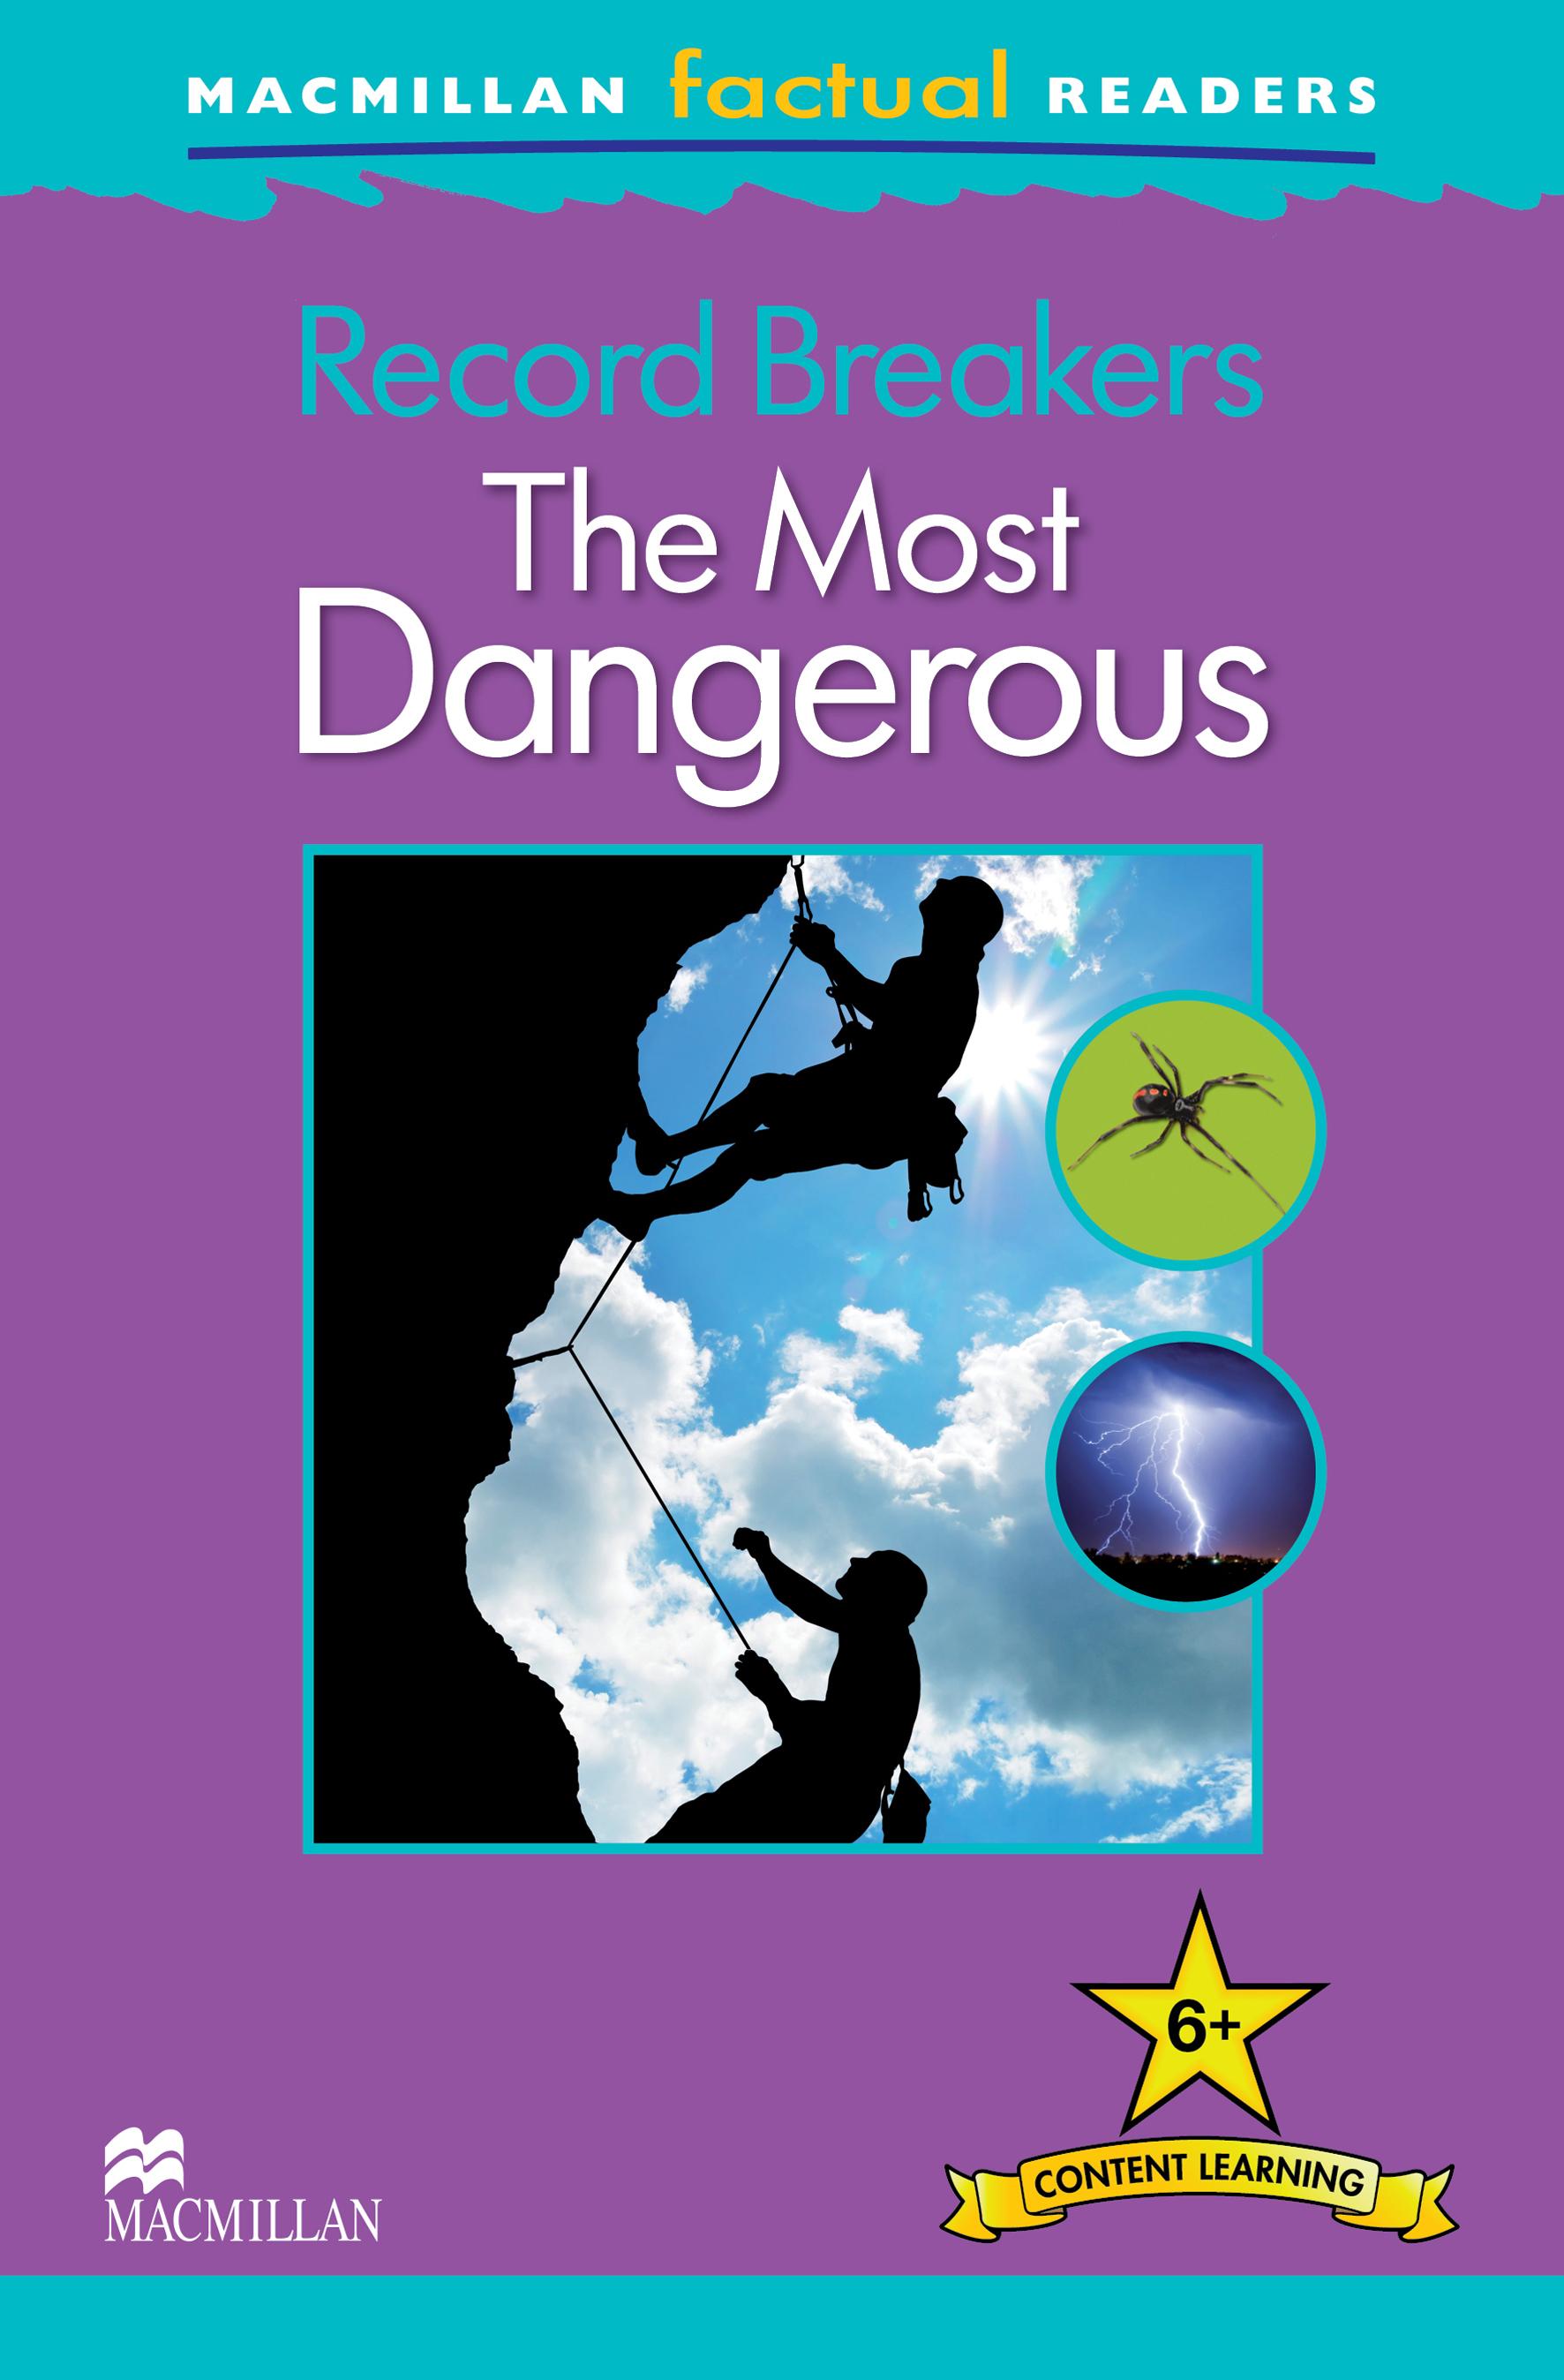 Macmillan Factual Readers Record Breakers - The Most Dangerous